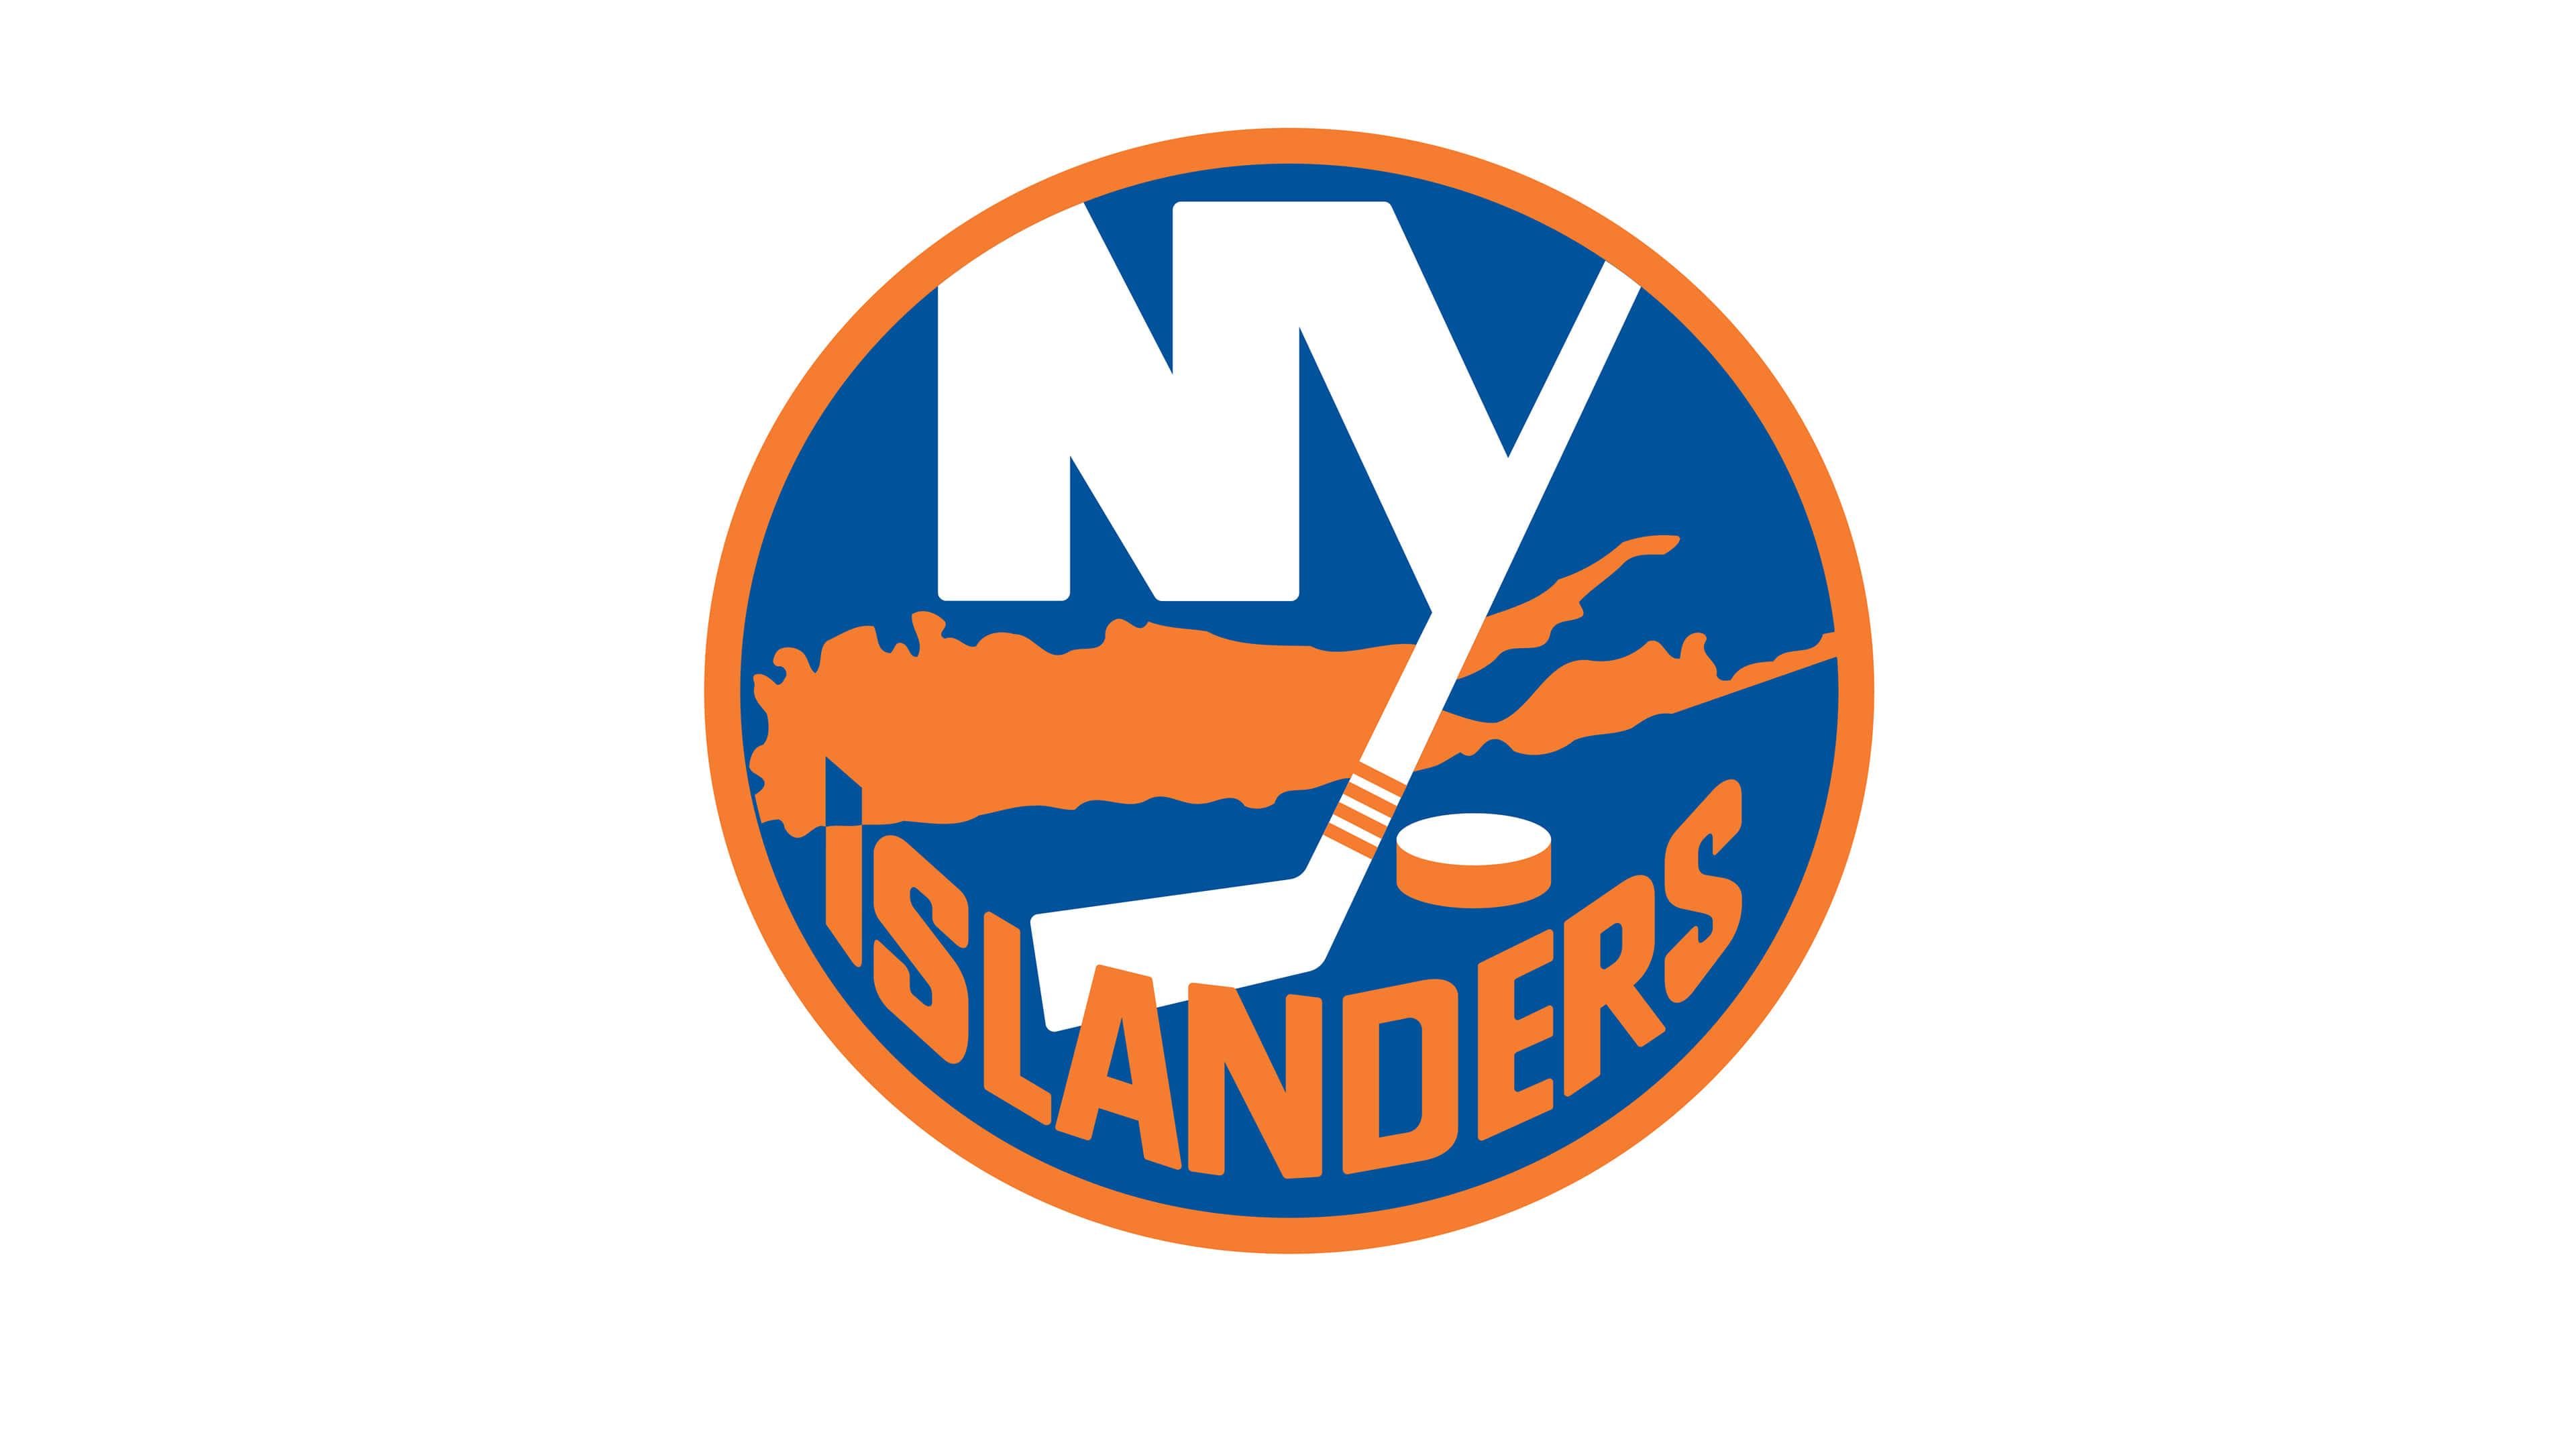 new york islanders nhl logo uhd 4k wallpaper